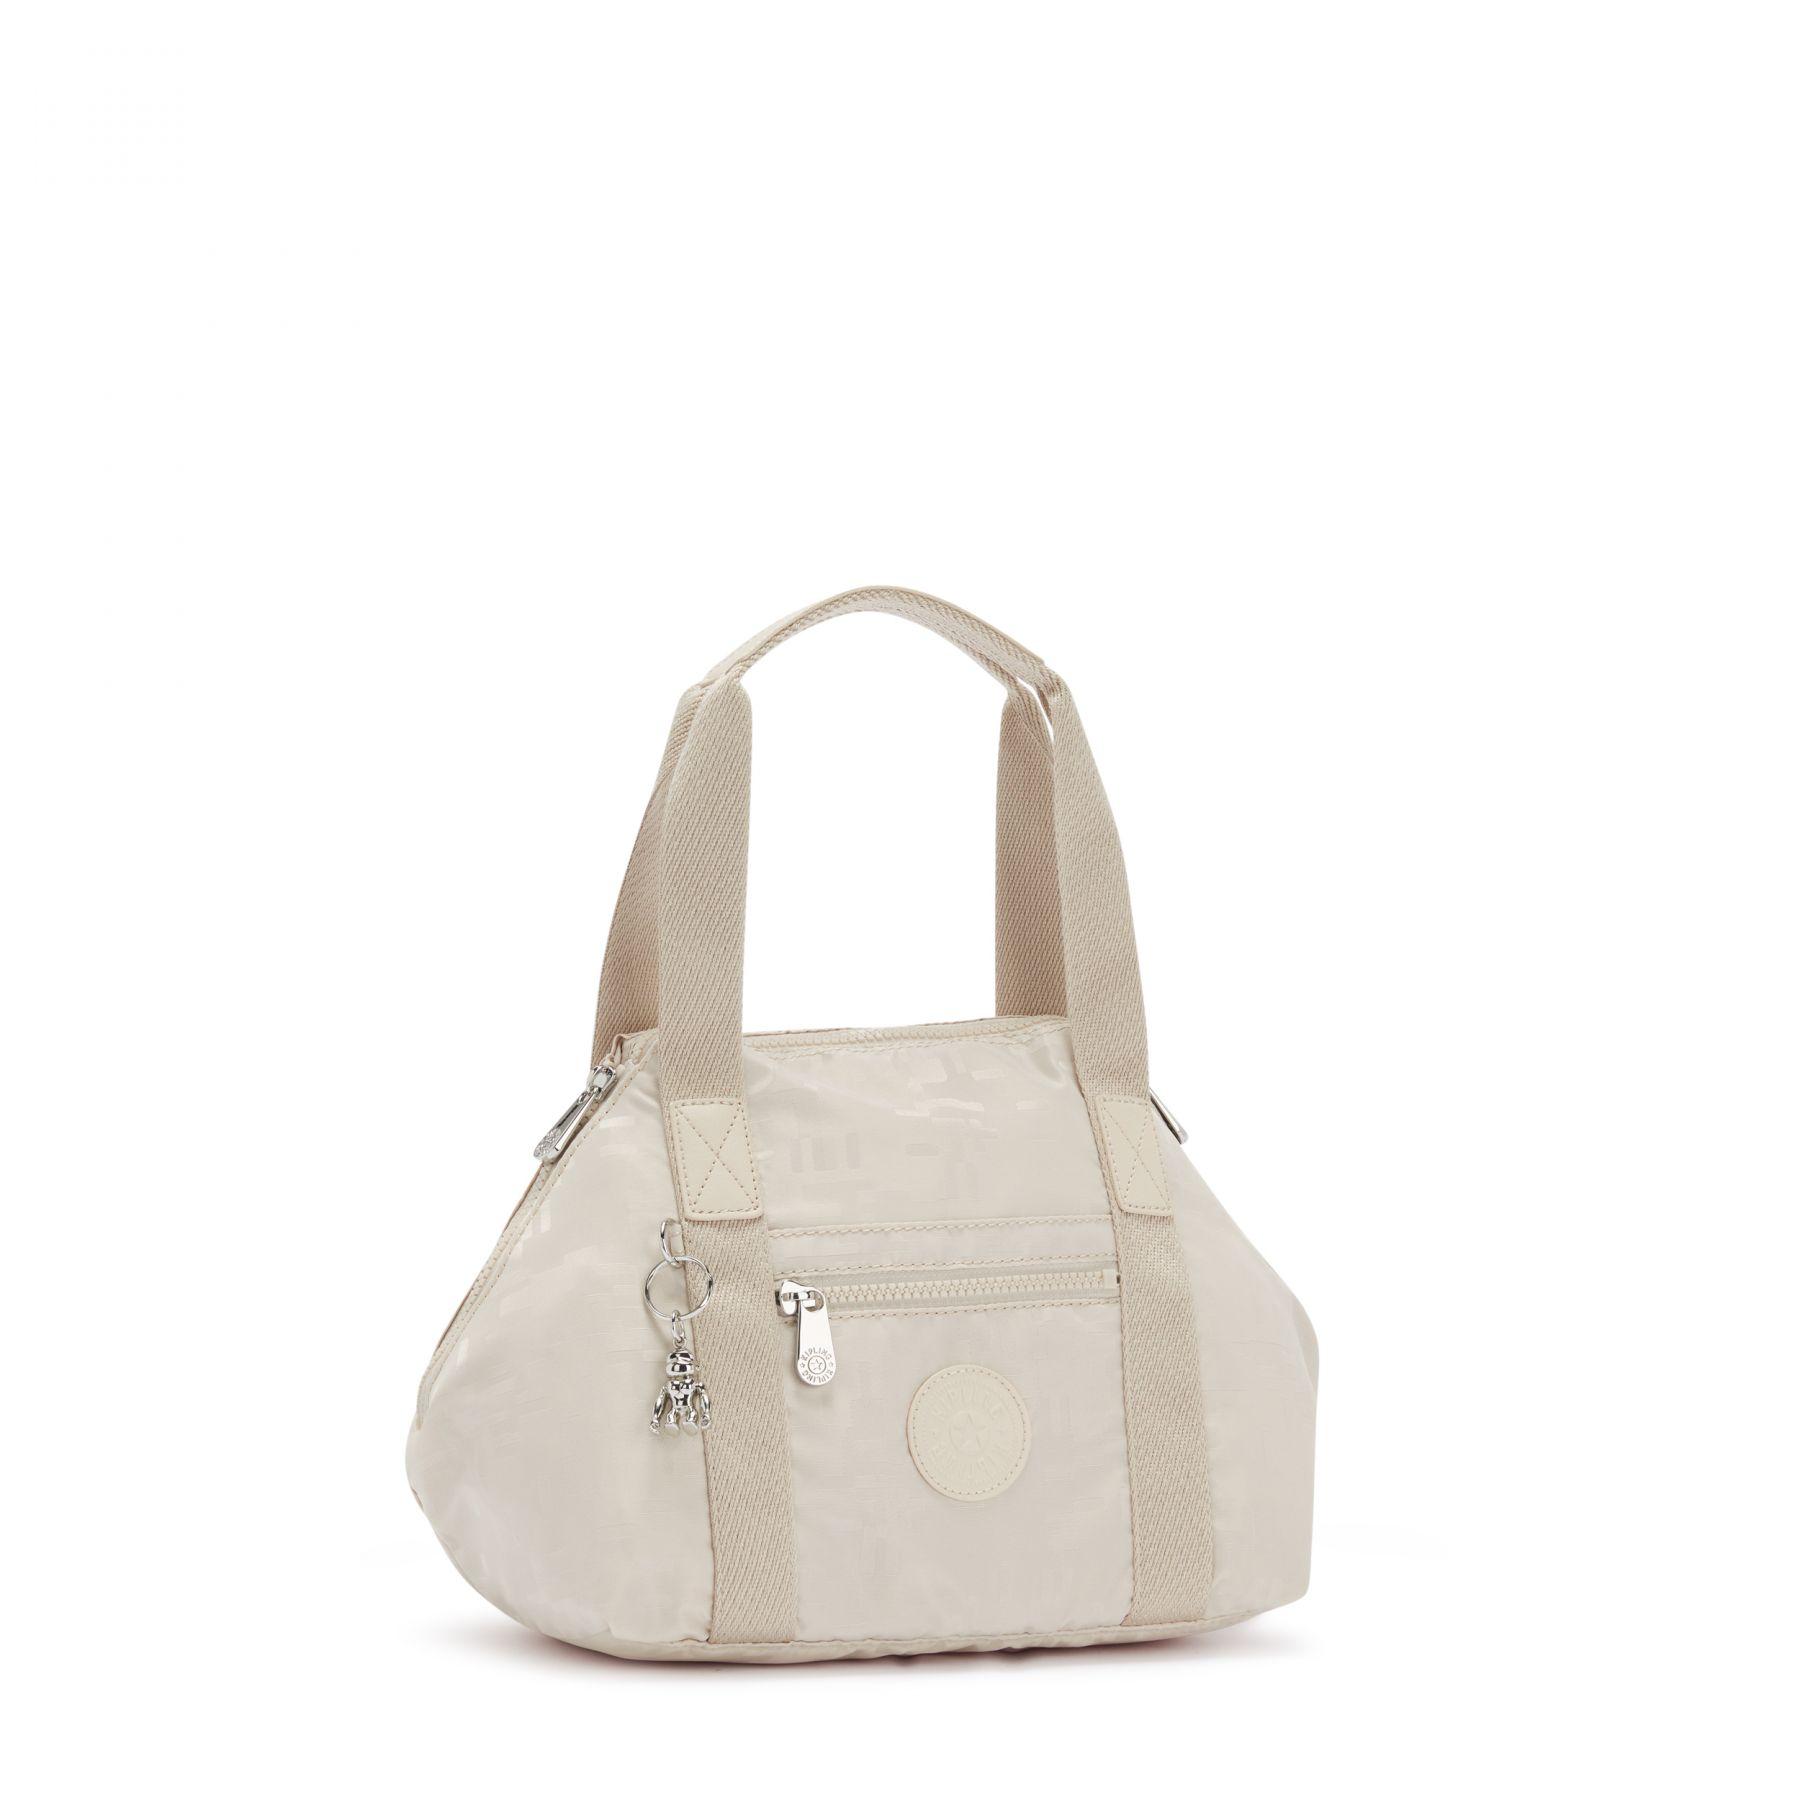 ART MINI BAGS by Kipling